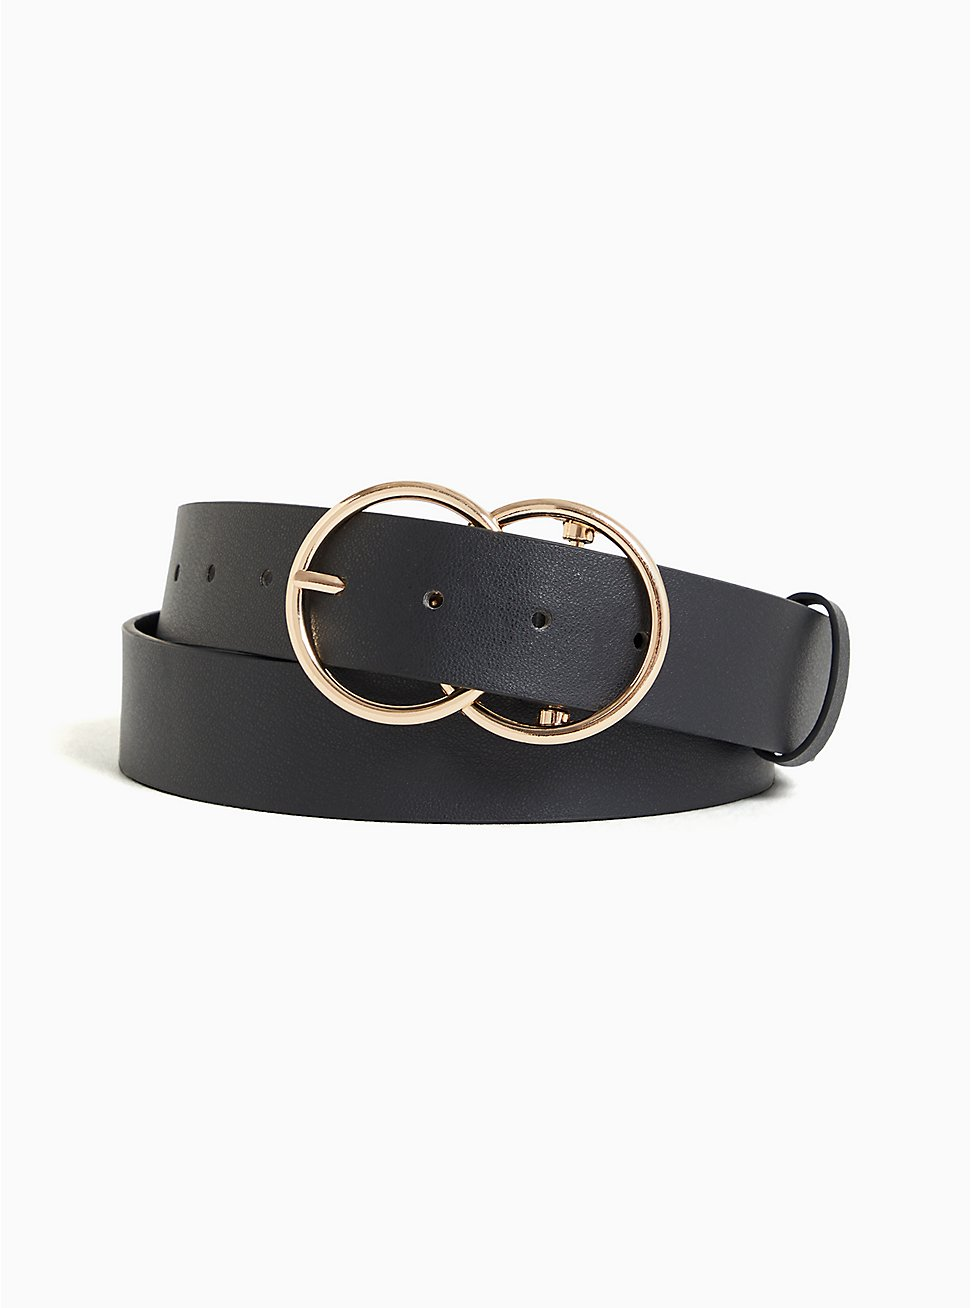 Black Faux Leather Dual Ring Buckle Belt, BLACK, hi-res